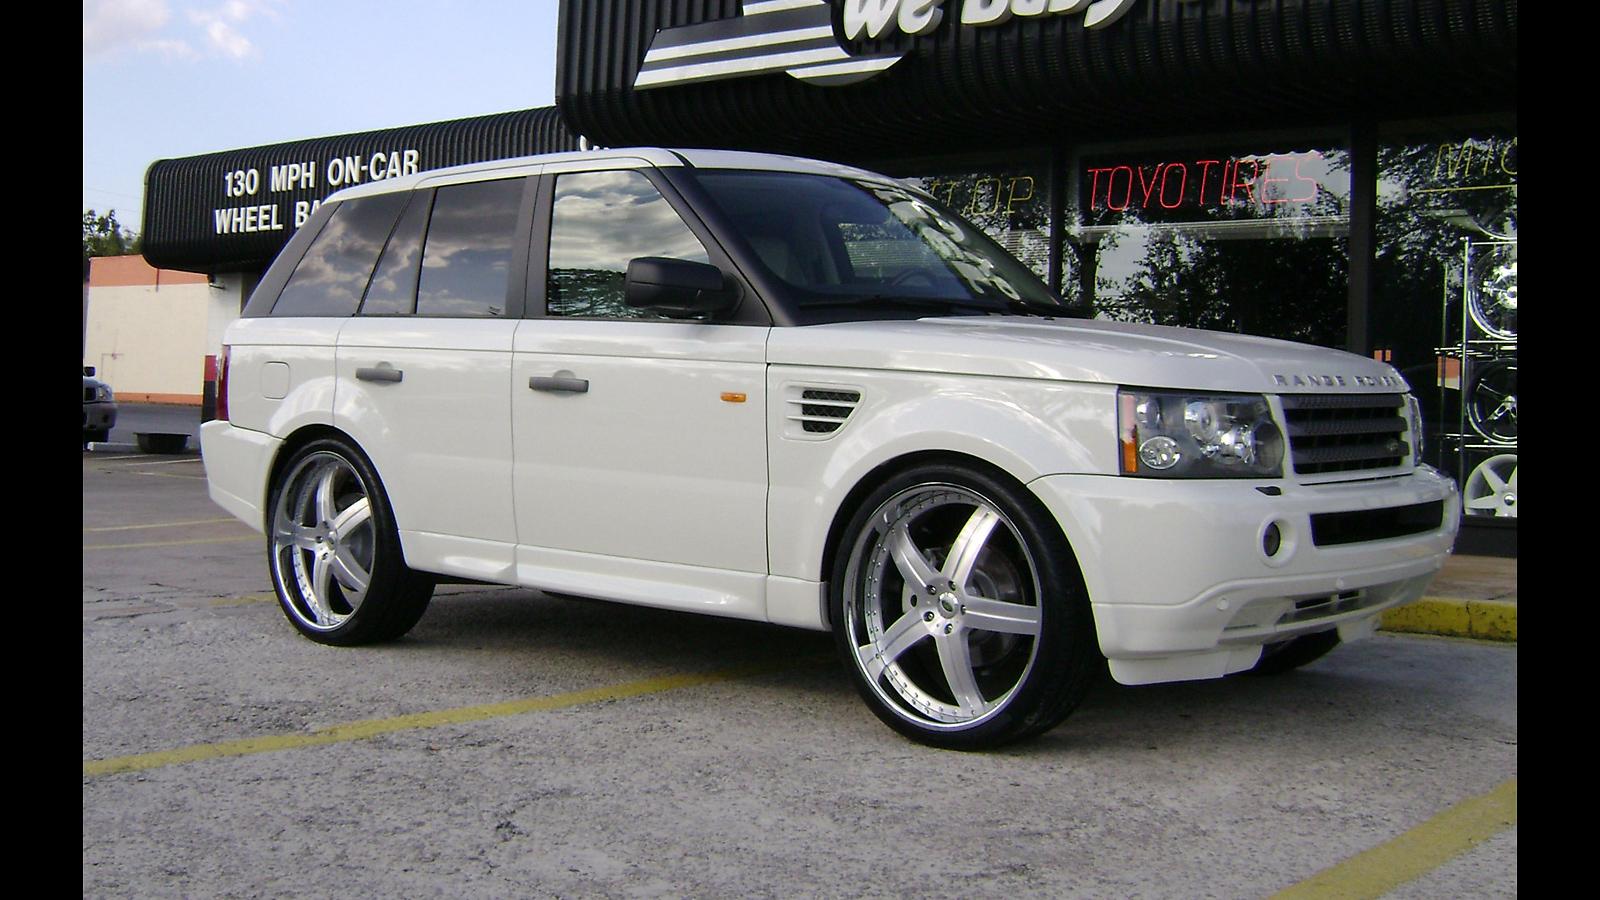 Range Rover Black >> 2007 LAND ROVER RANGE ROVER - Image #12